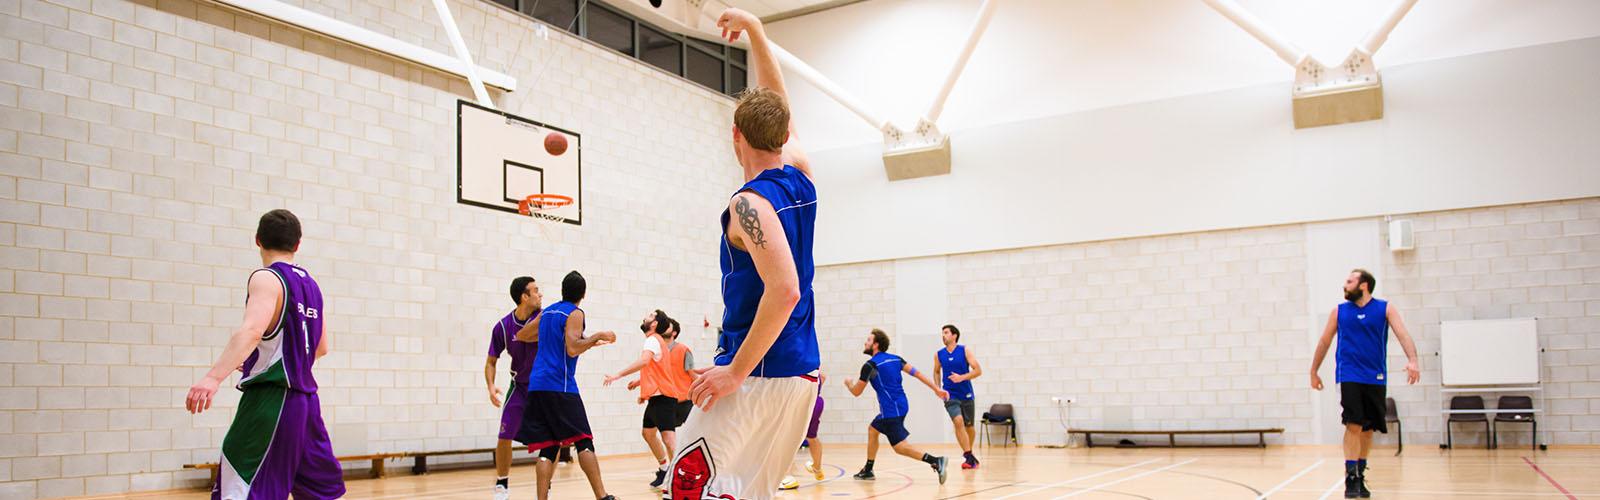 _0037_GOMammoth-Basketball-London